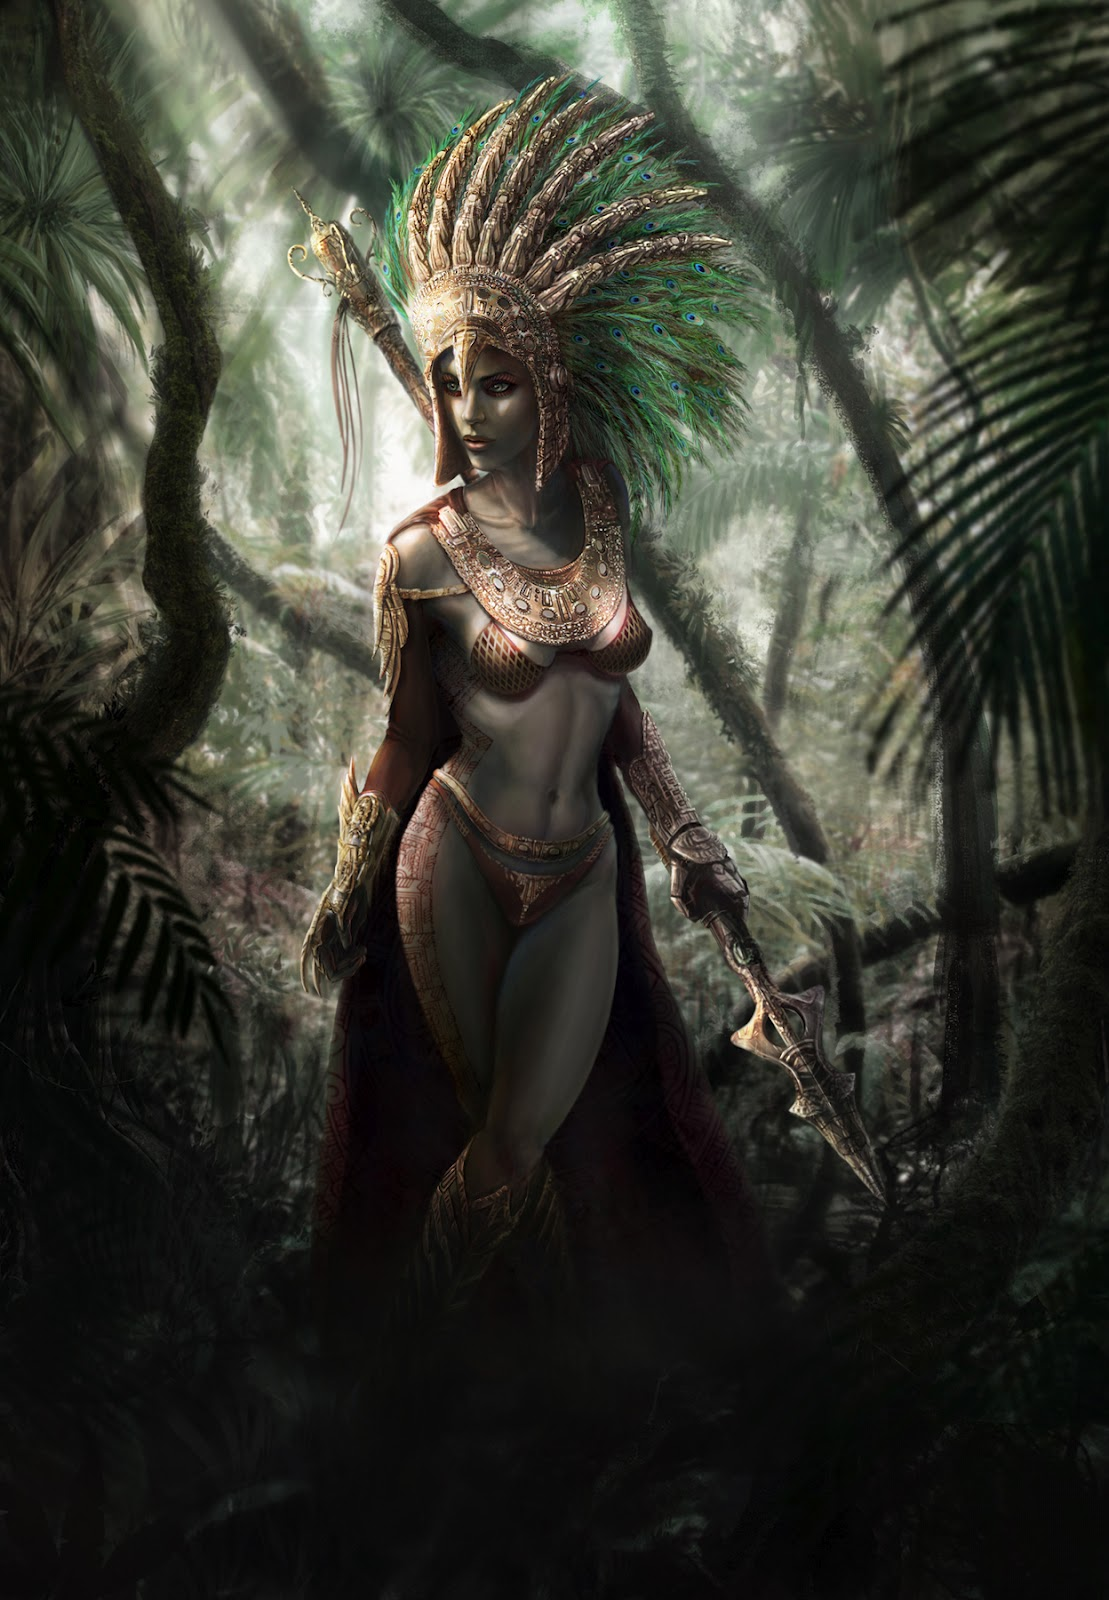 Aztec sacrifice girl xxx image